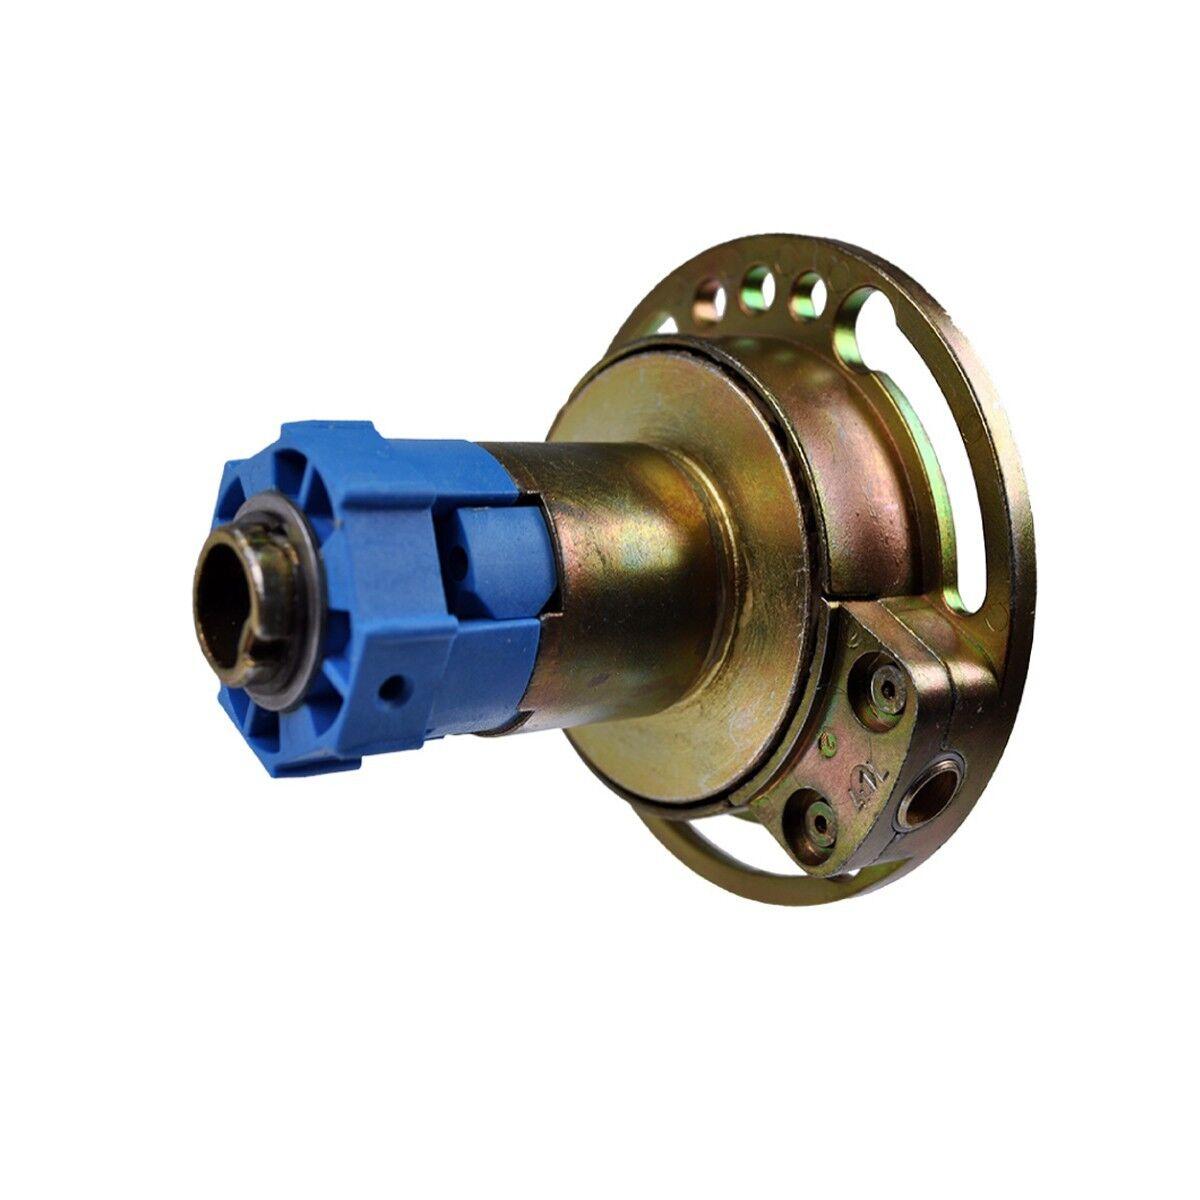 Kegelradgetriebe Rolladengetriebe Kurbelgetriebe Rolladenantriebe 4 1